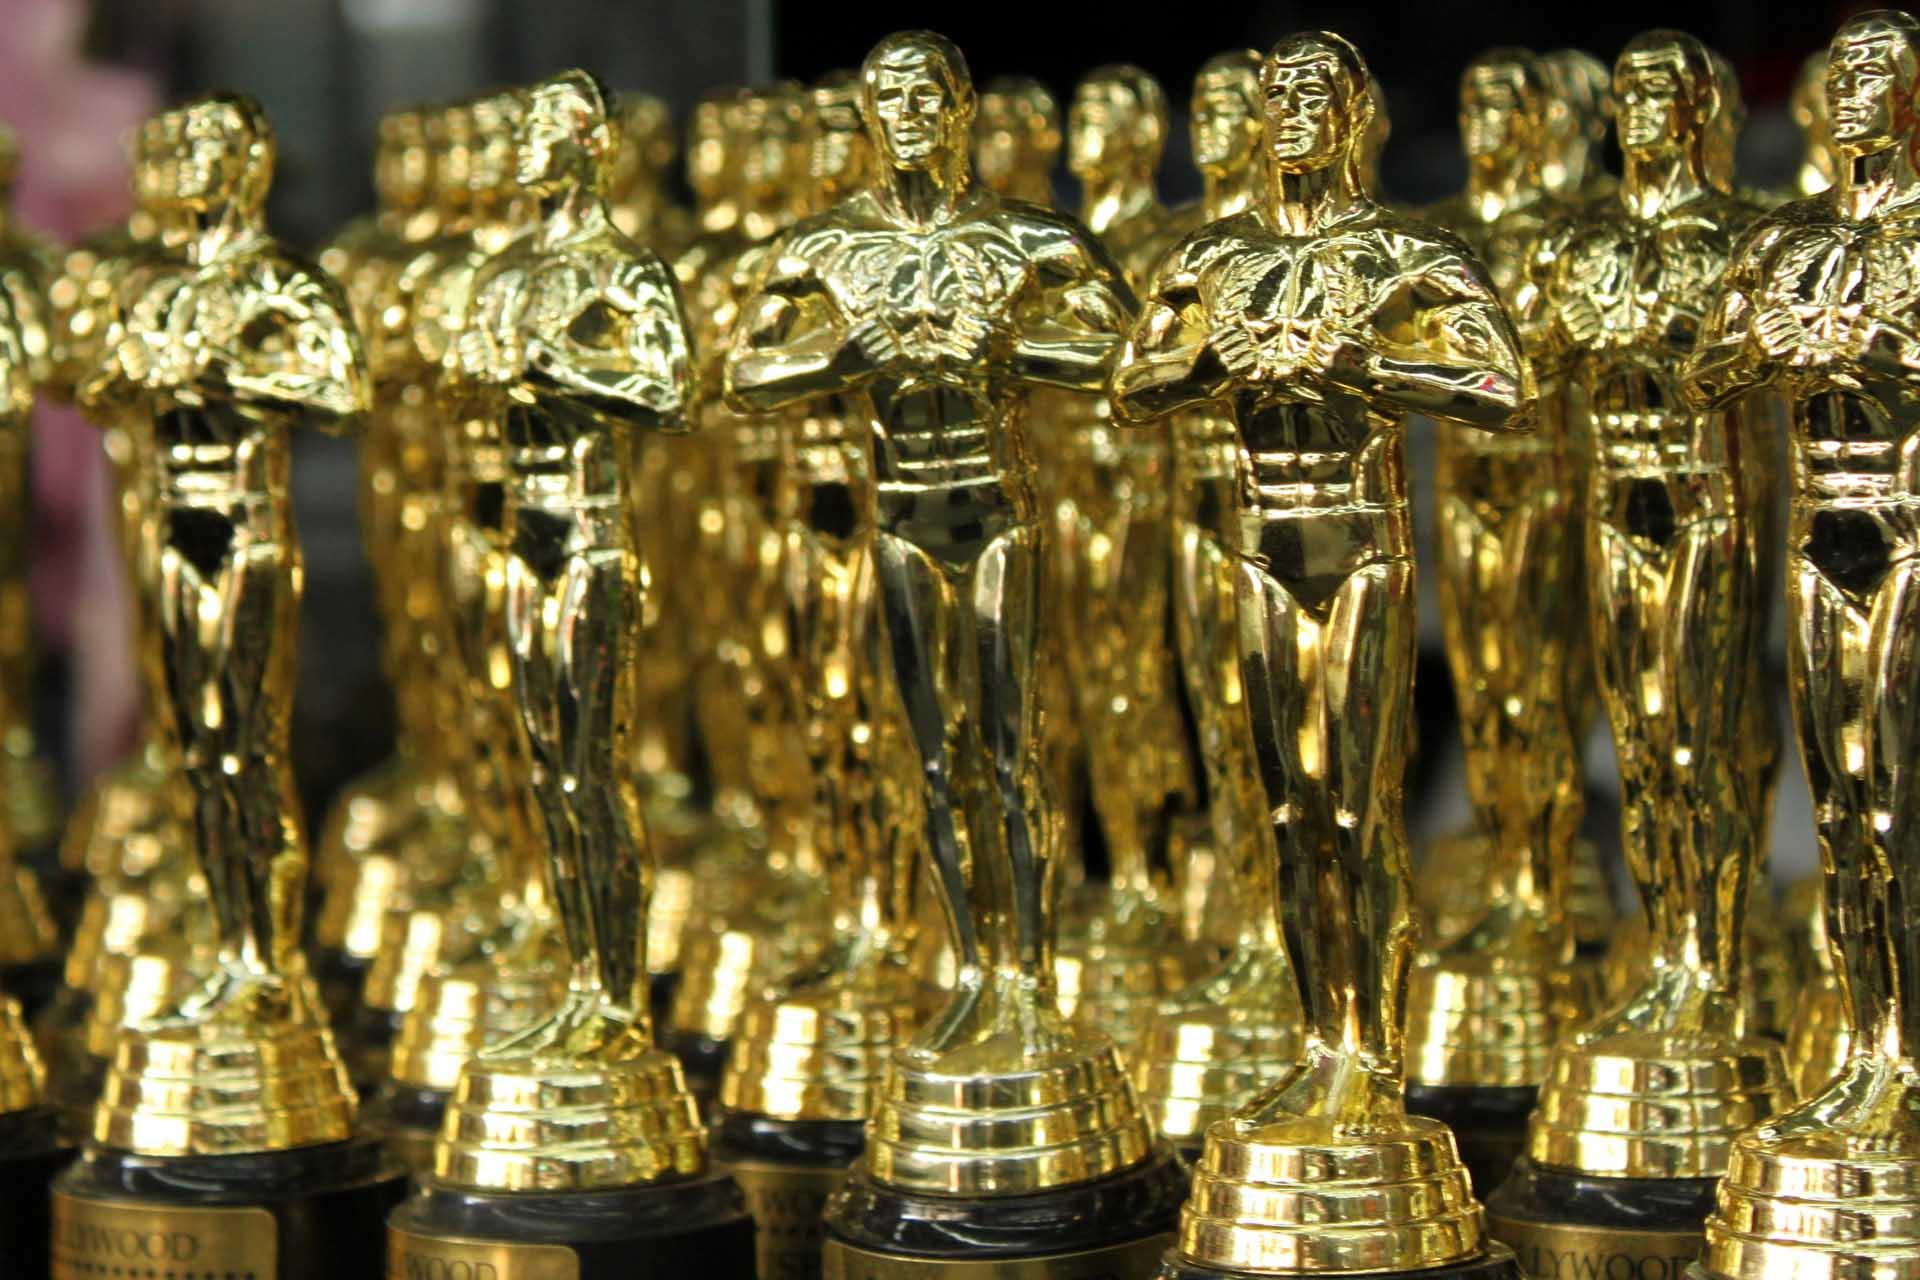 Best Oscar Movie Websites - Intechnic's Award Winners for 2017